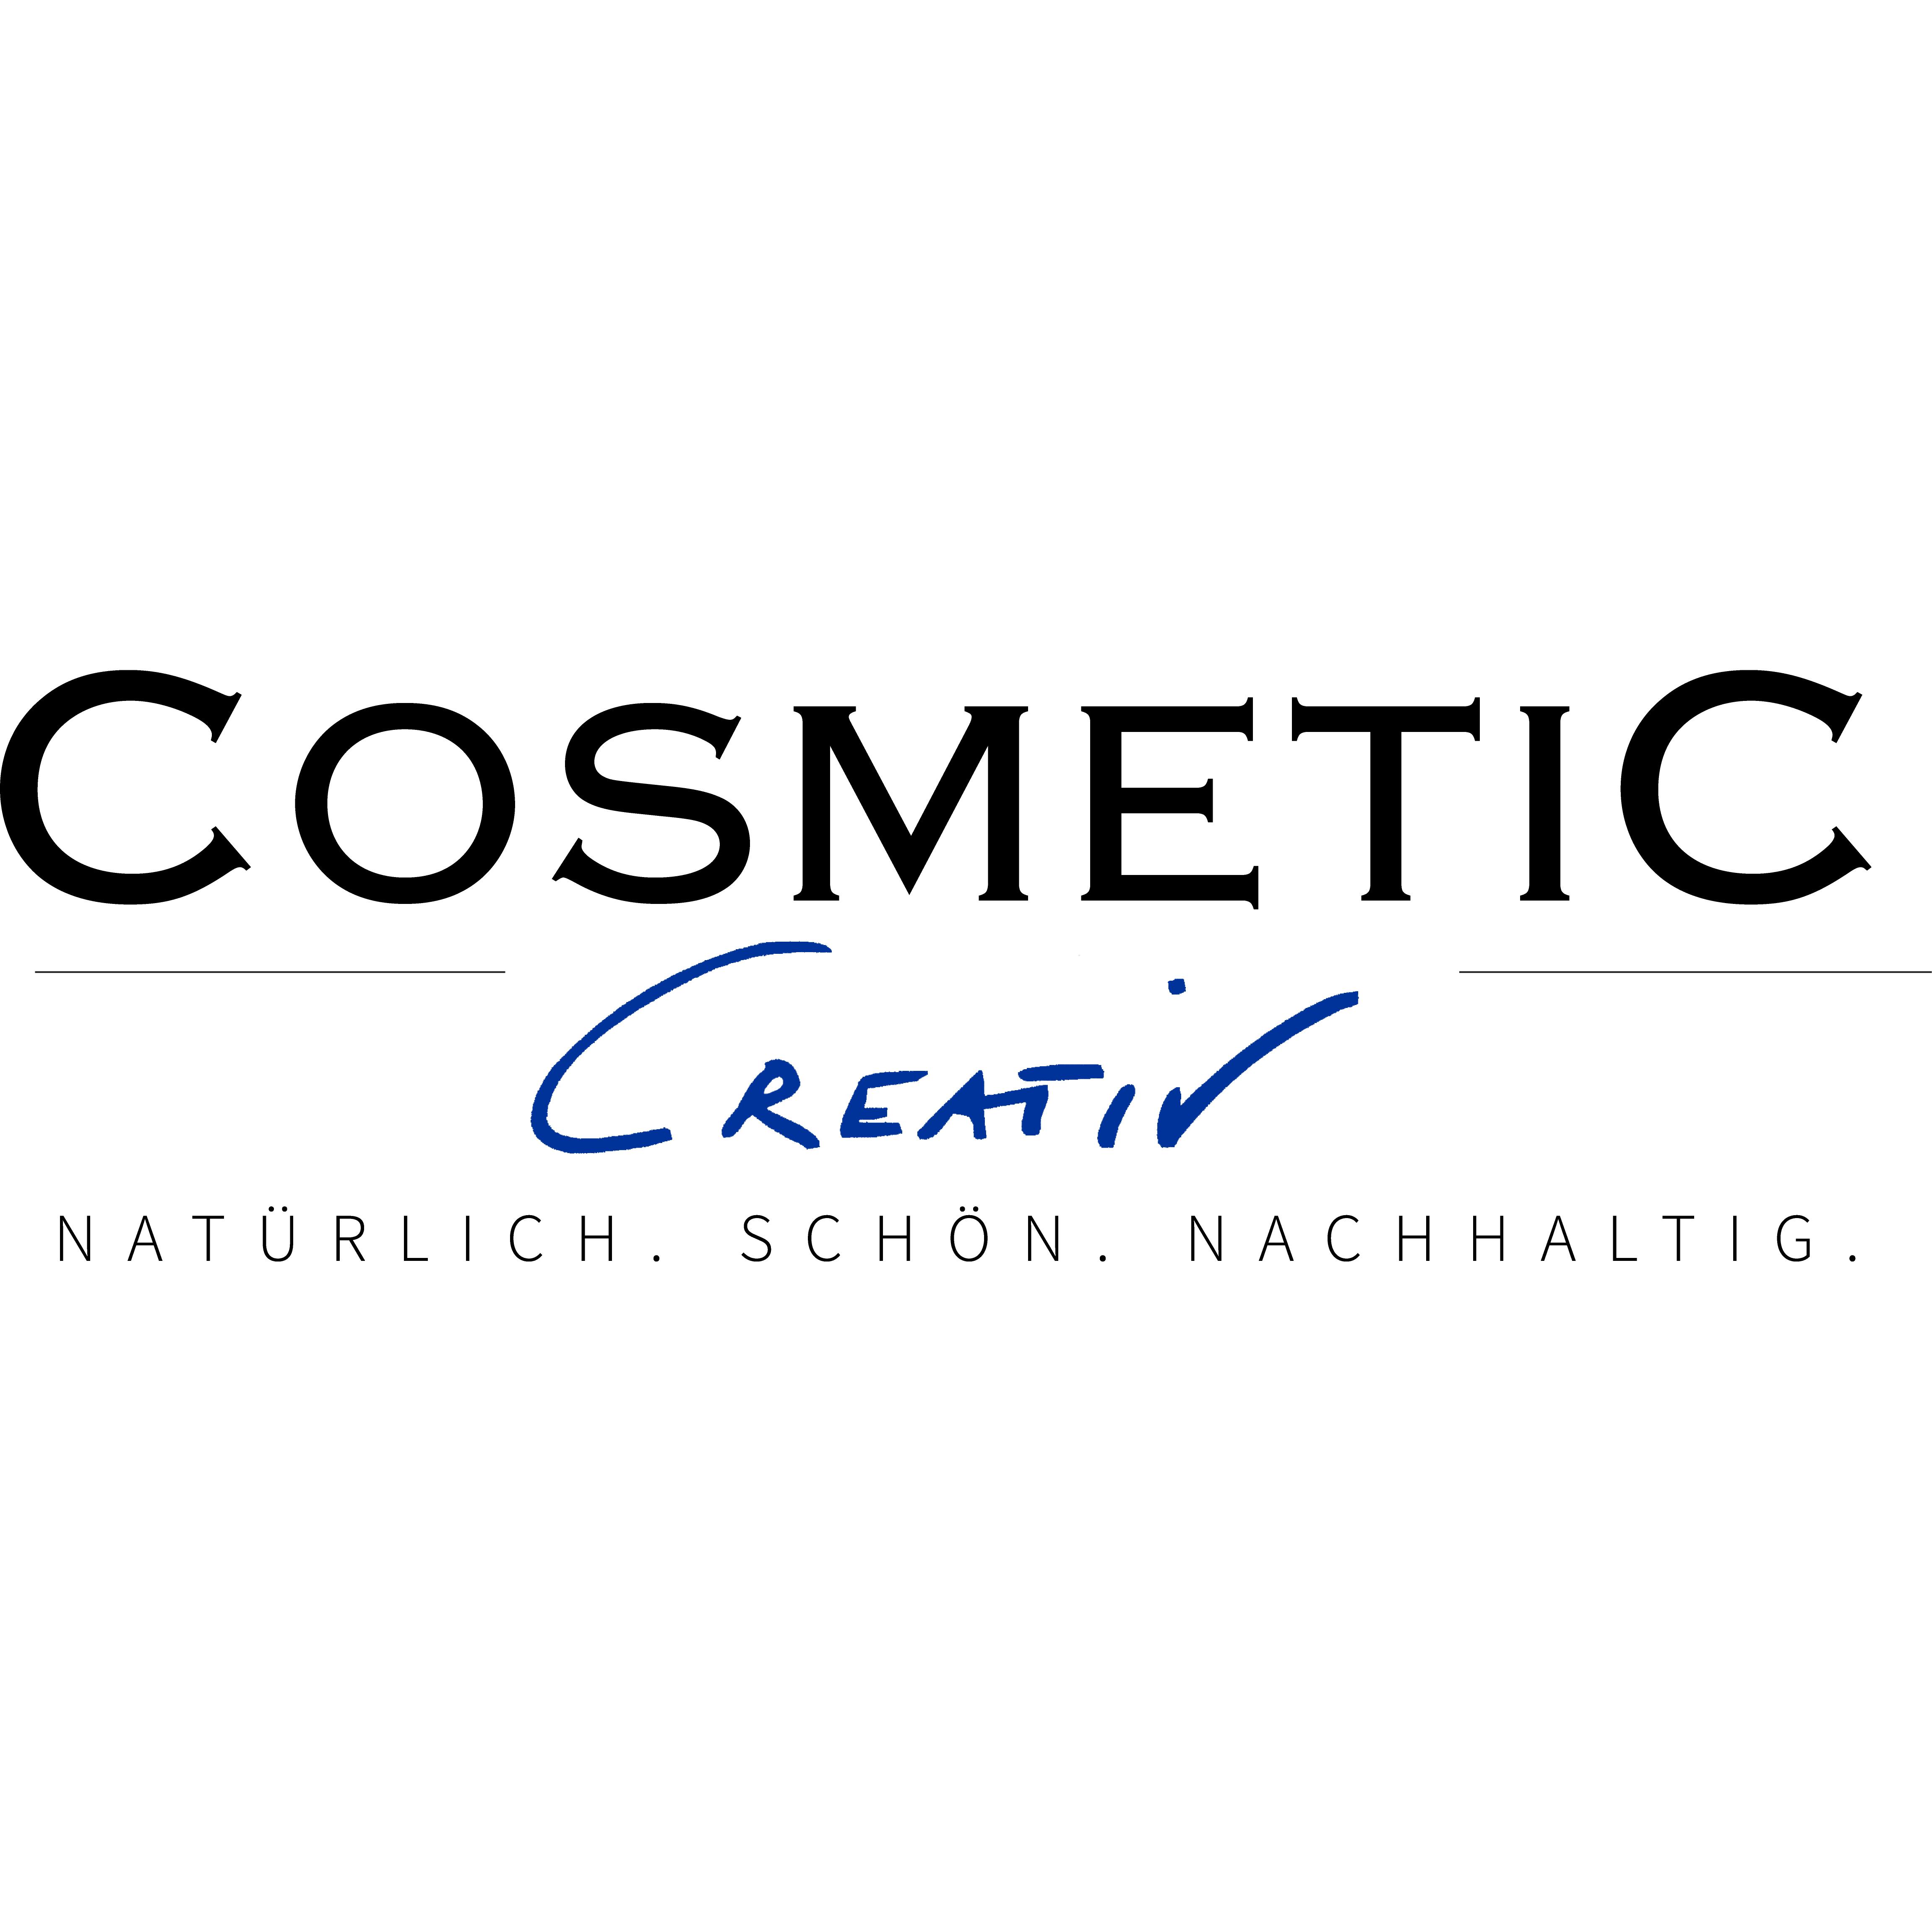 Bild zu Cosmetic creativ in Kulmbach